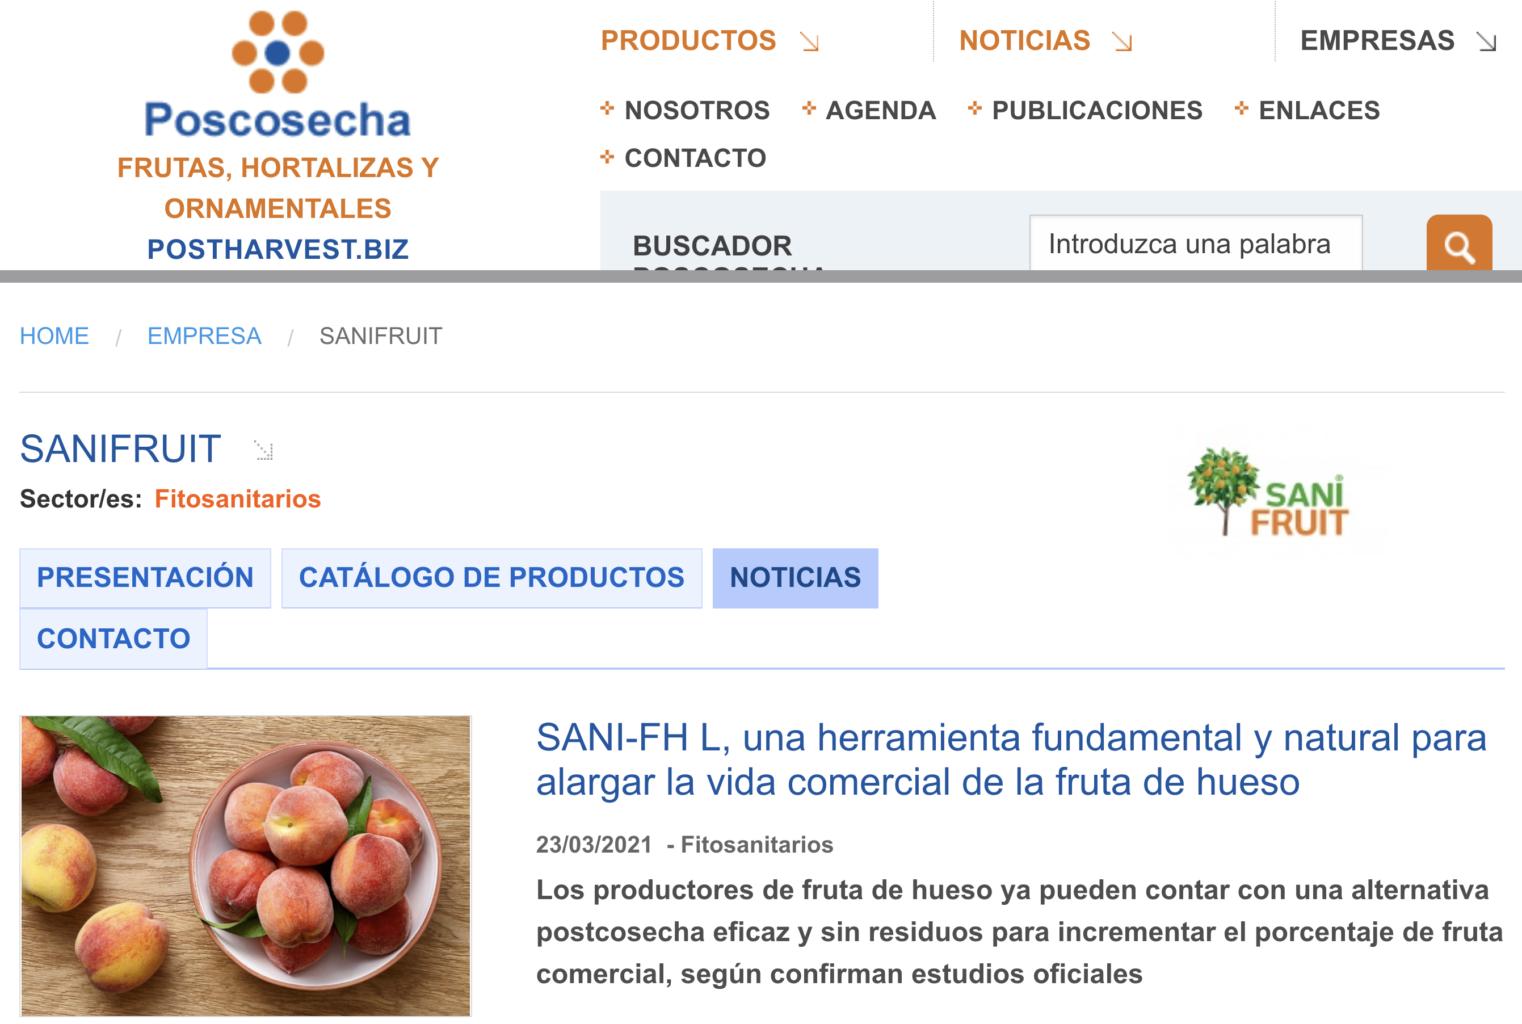 SANI-FH L en Poscosecha.com